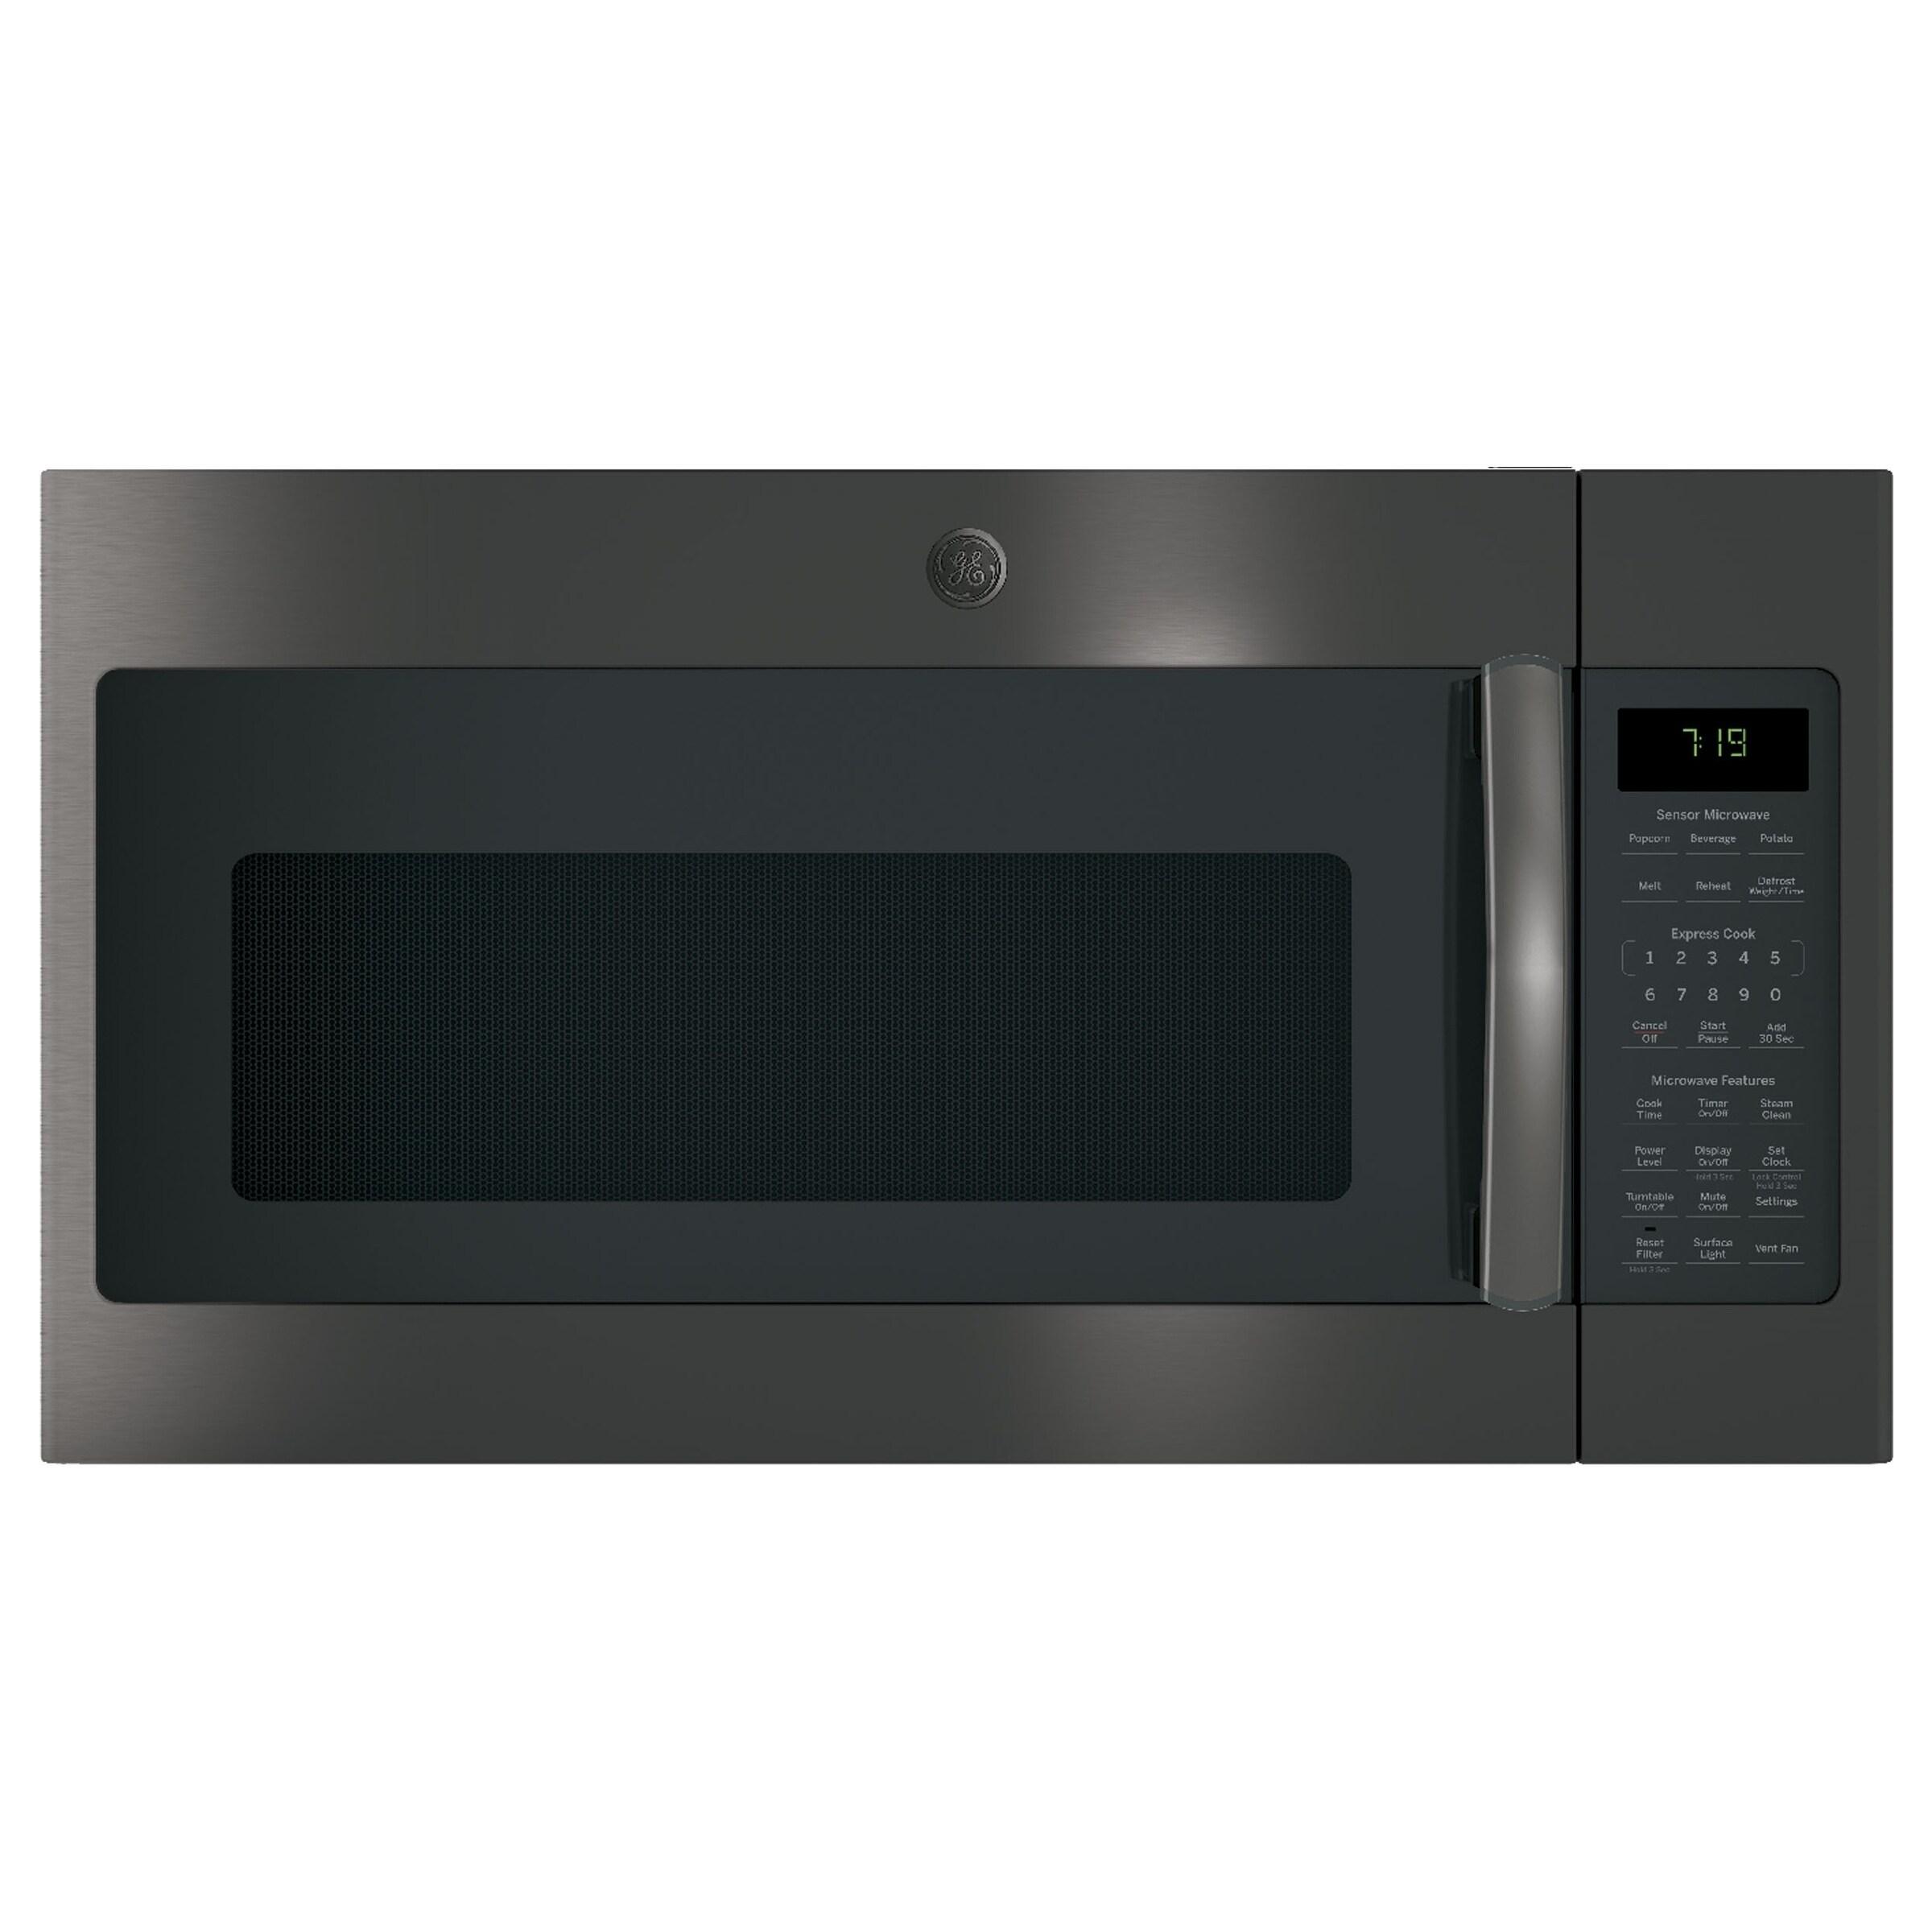 GE 1.9 Cu. Ft. Over-the-Range Sensor Microwave Oven 1.6 - 2.0 cf - Black - Clock Display